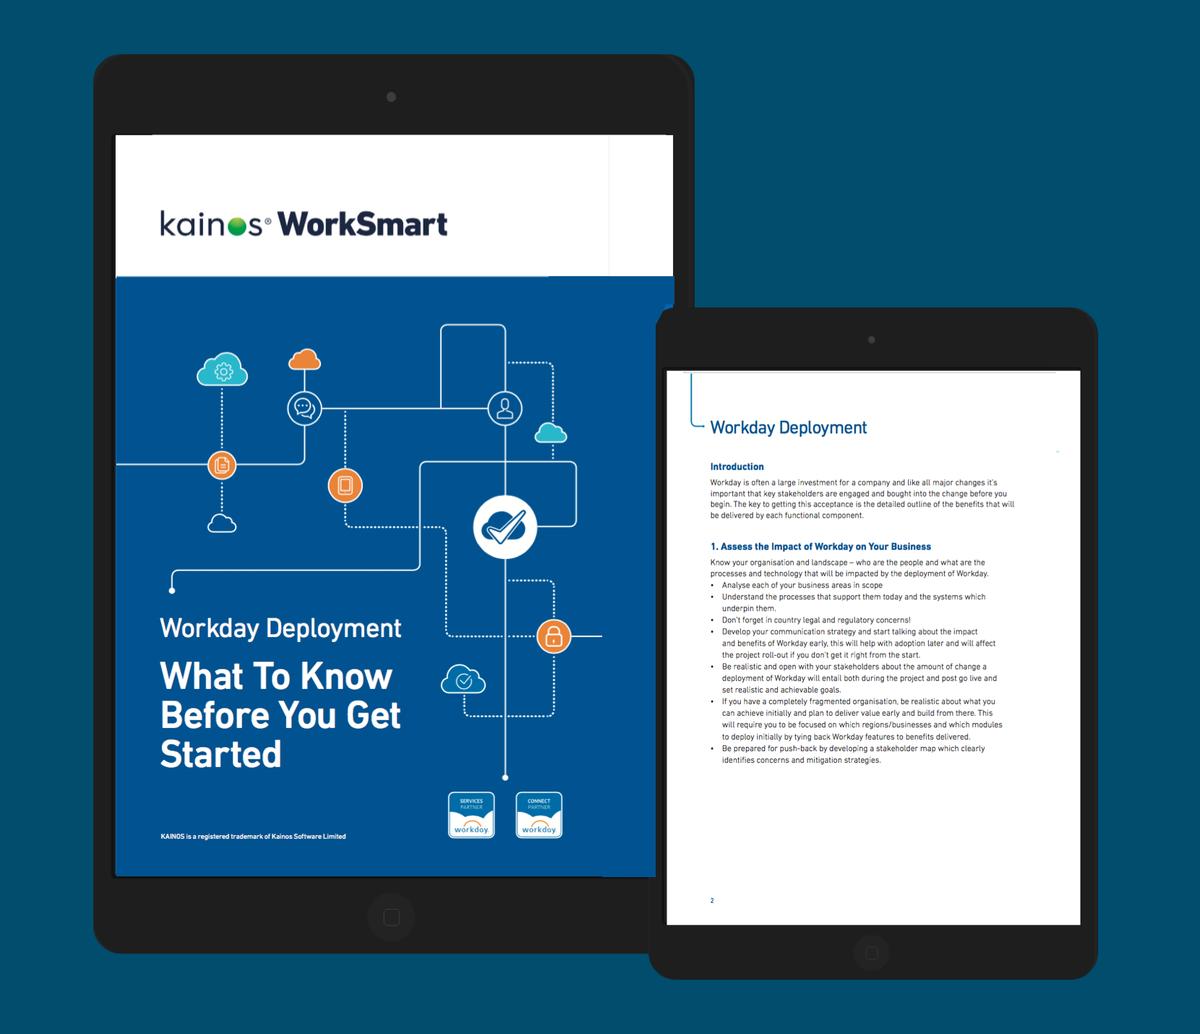 Workday Deployment Guide | Whitepapers | Kainos WorkSmart